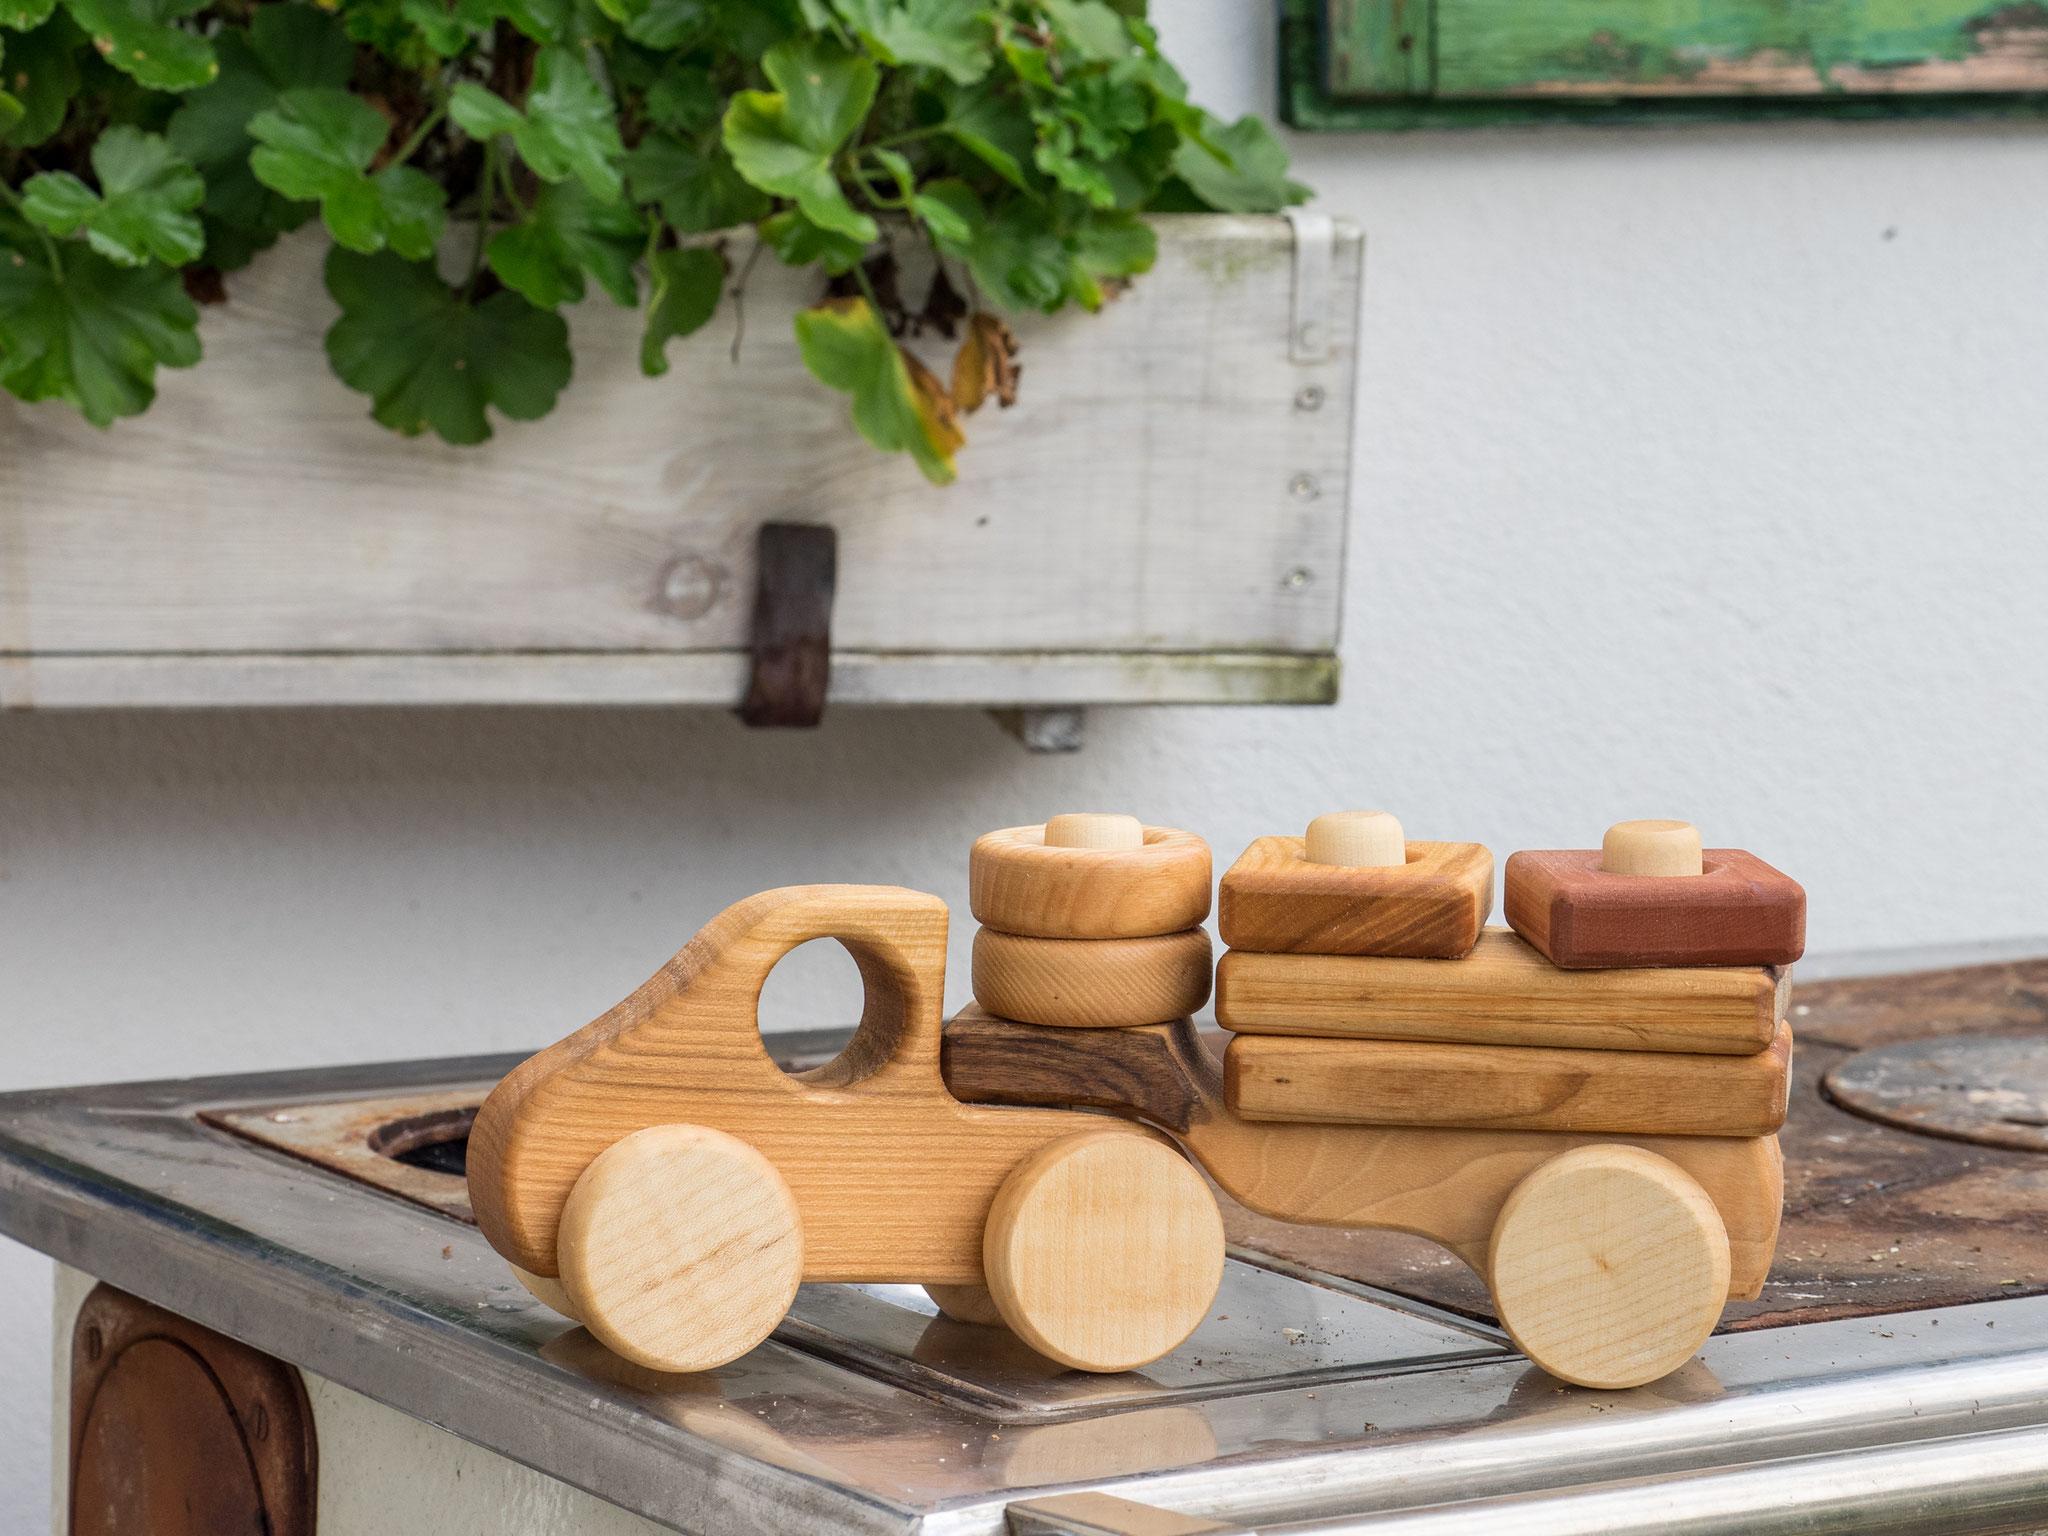 Holzlaster aus Holz